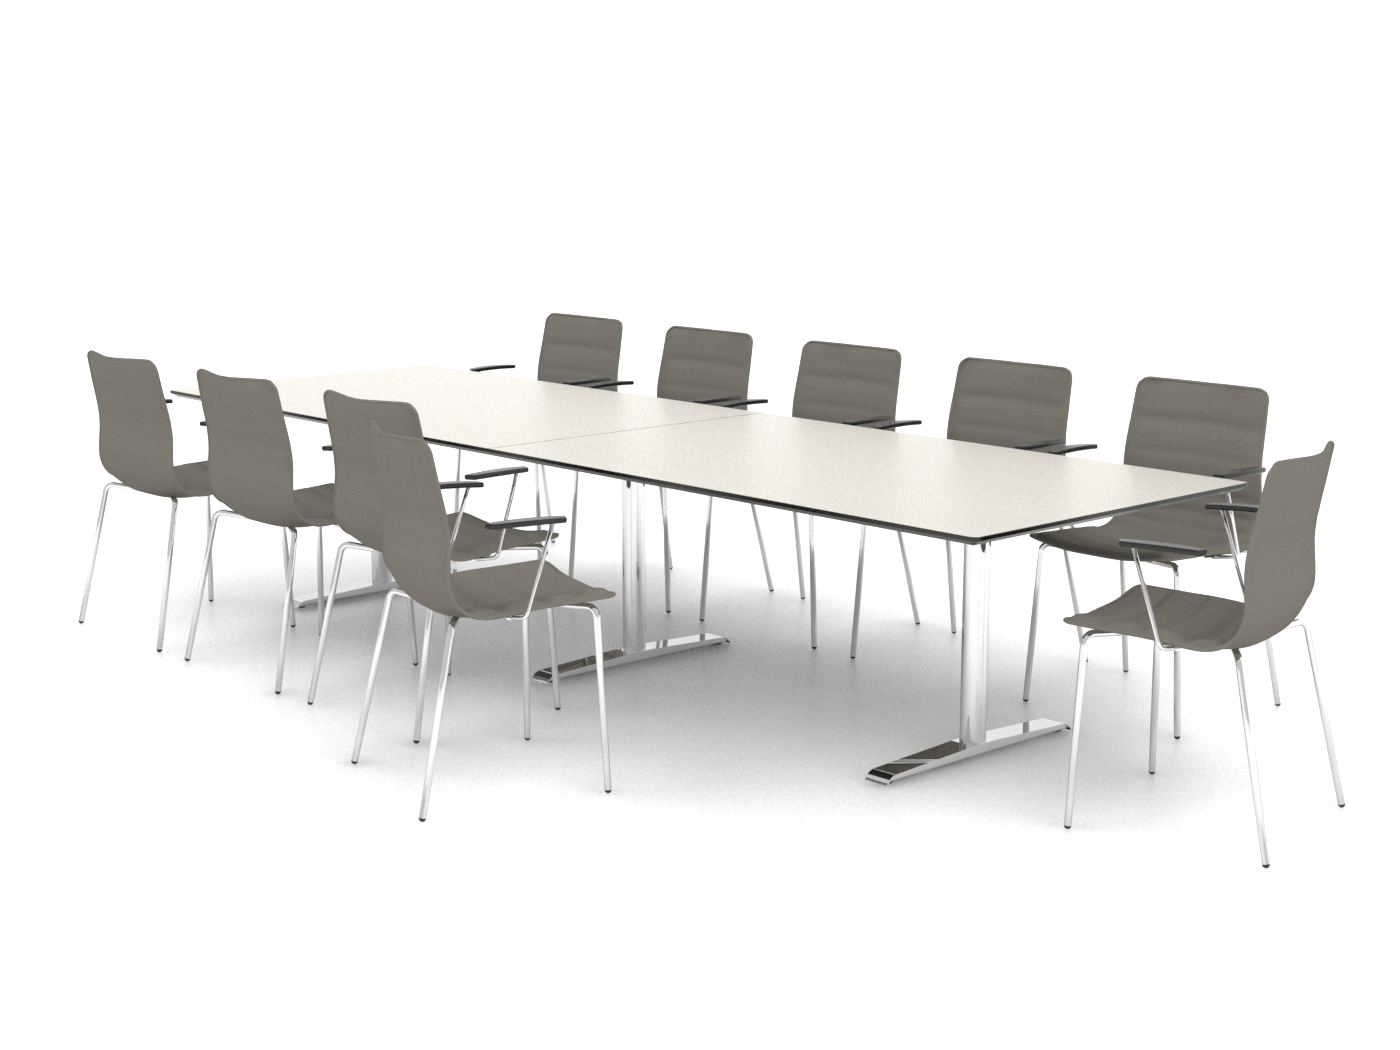 Cube Design - rektangulær konferencebord - Quadro T-stel - Quadro konferencebord